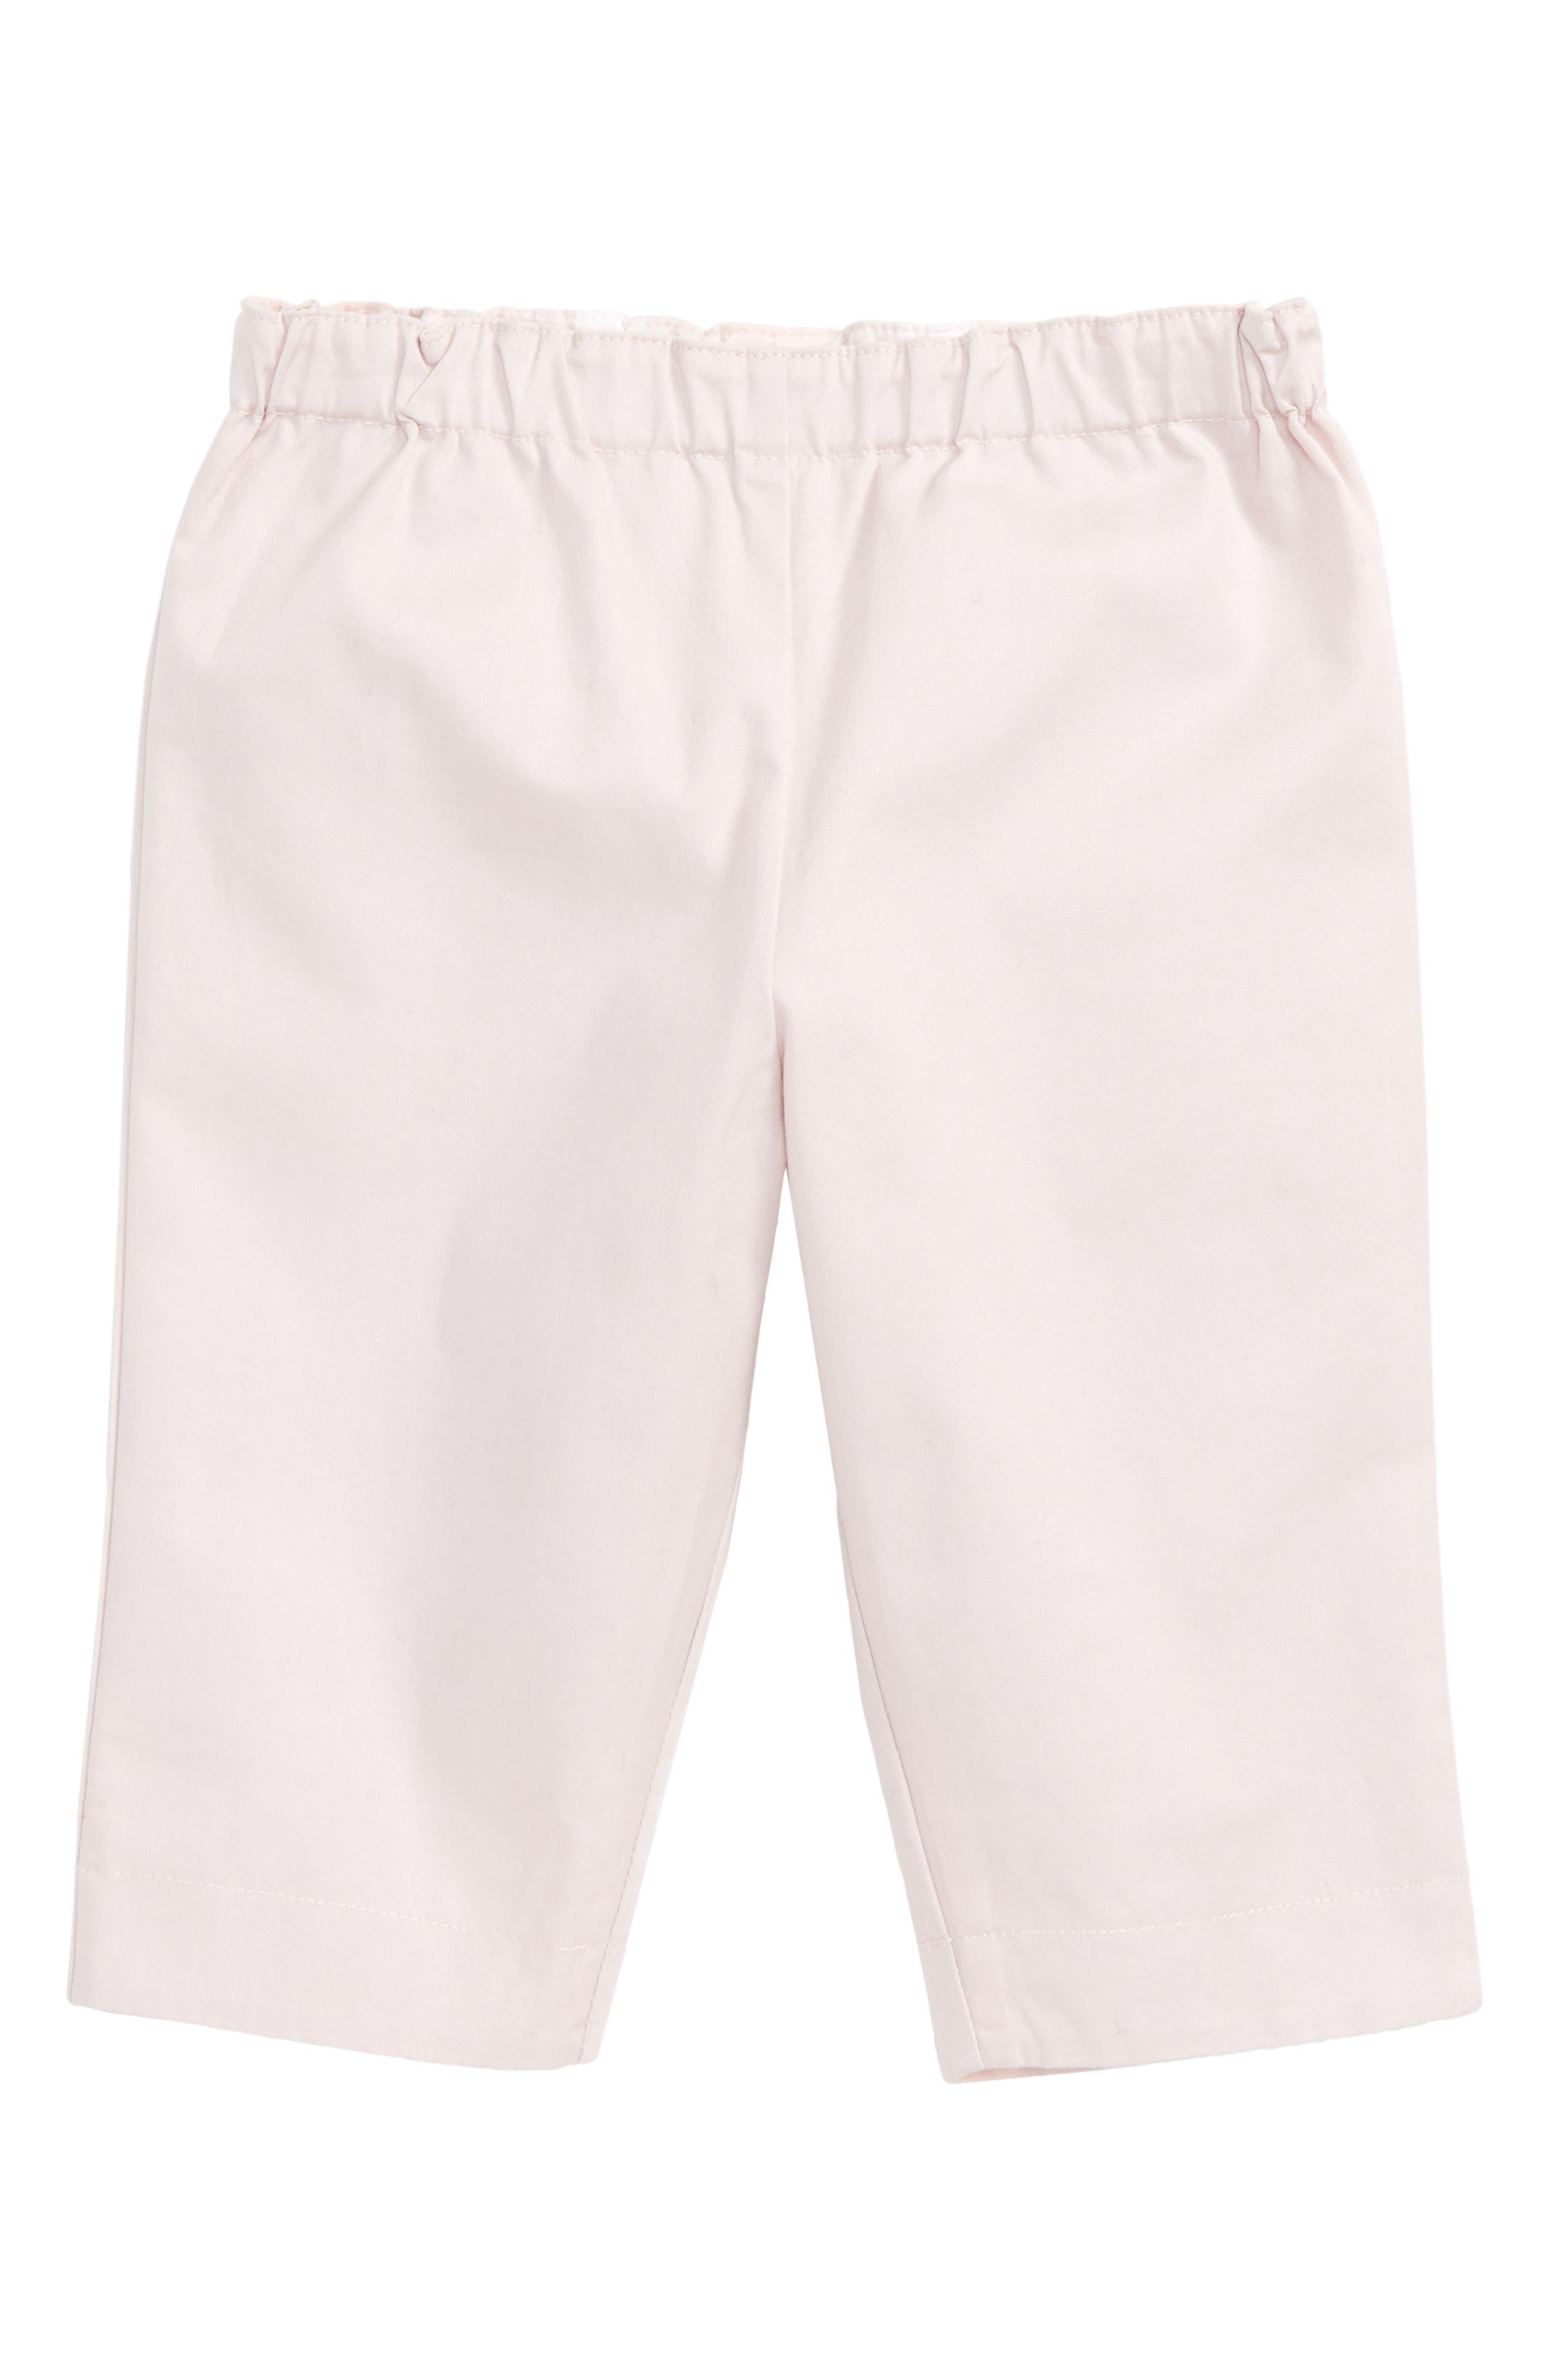 Darcy Pants,                         Main,                         color, 685